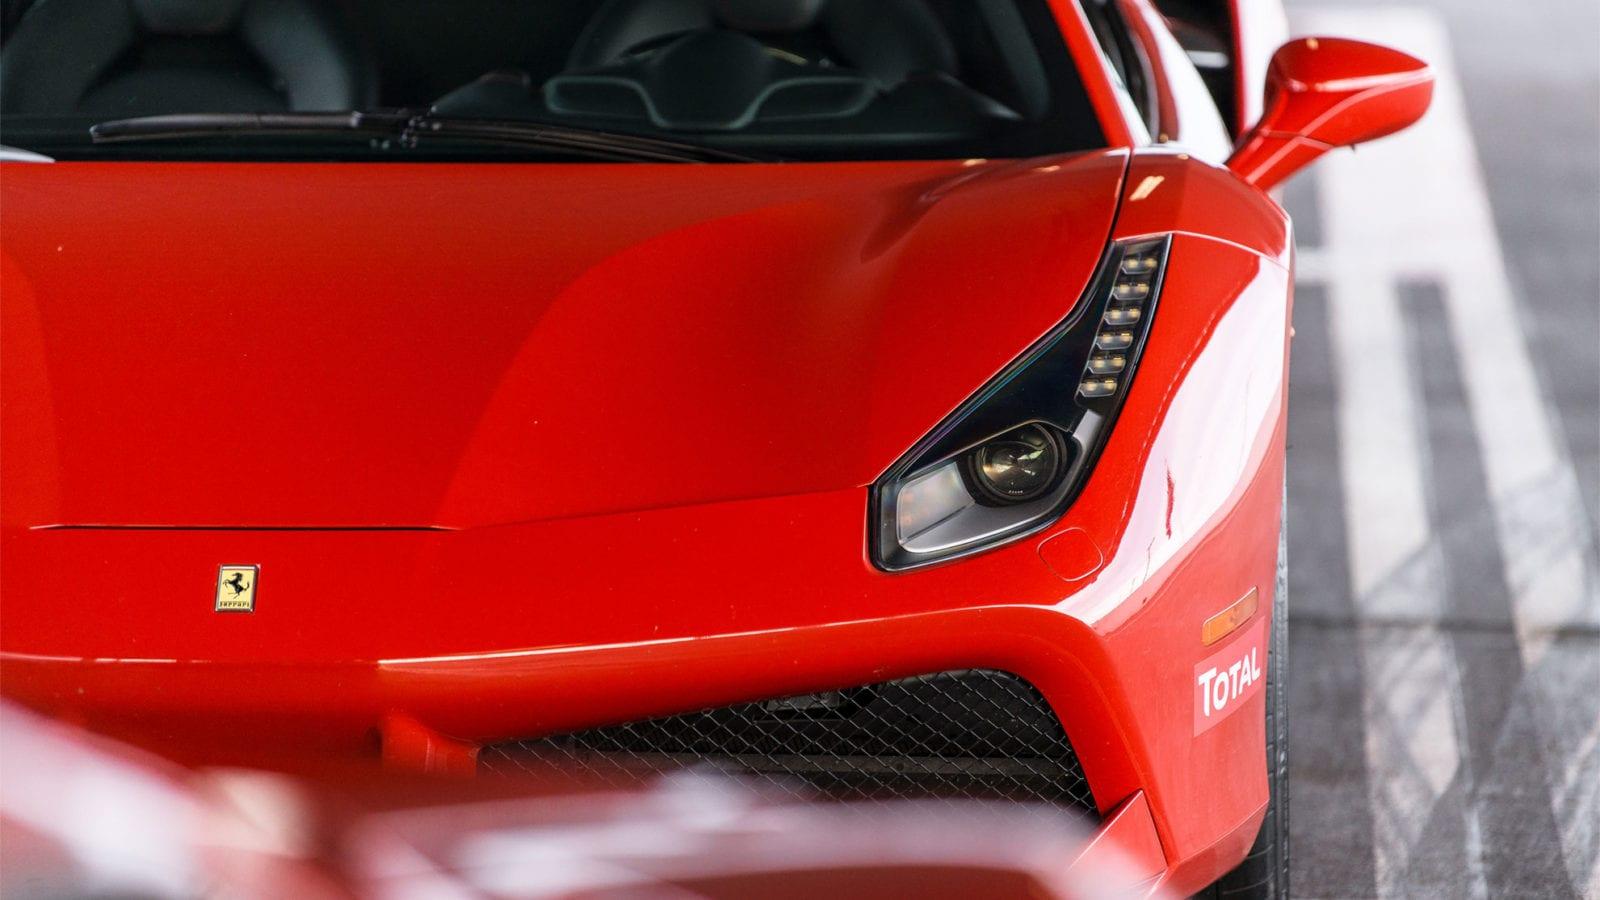 Ferrari 488 GTB in red front end